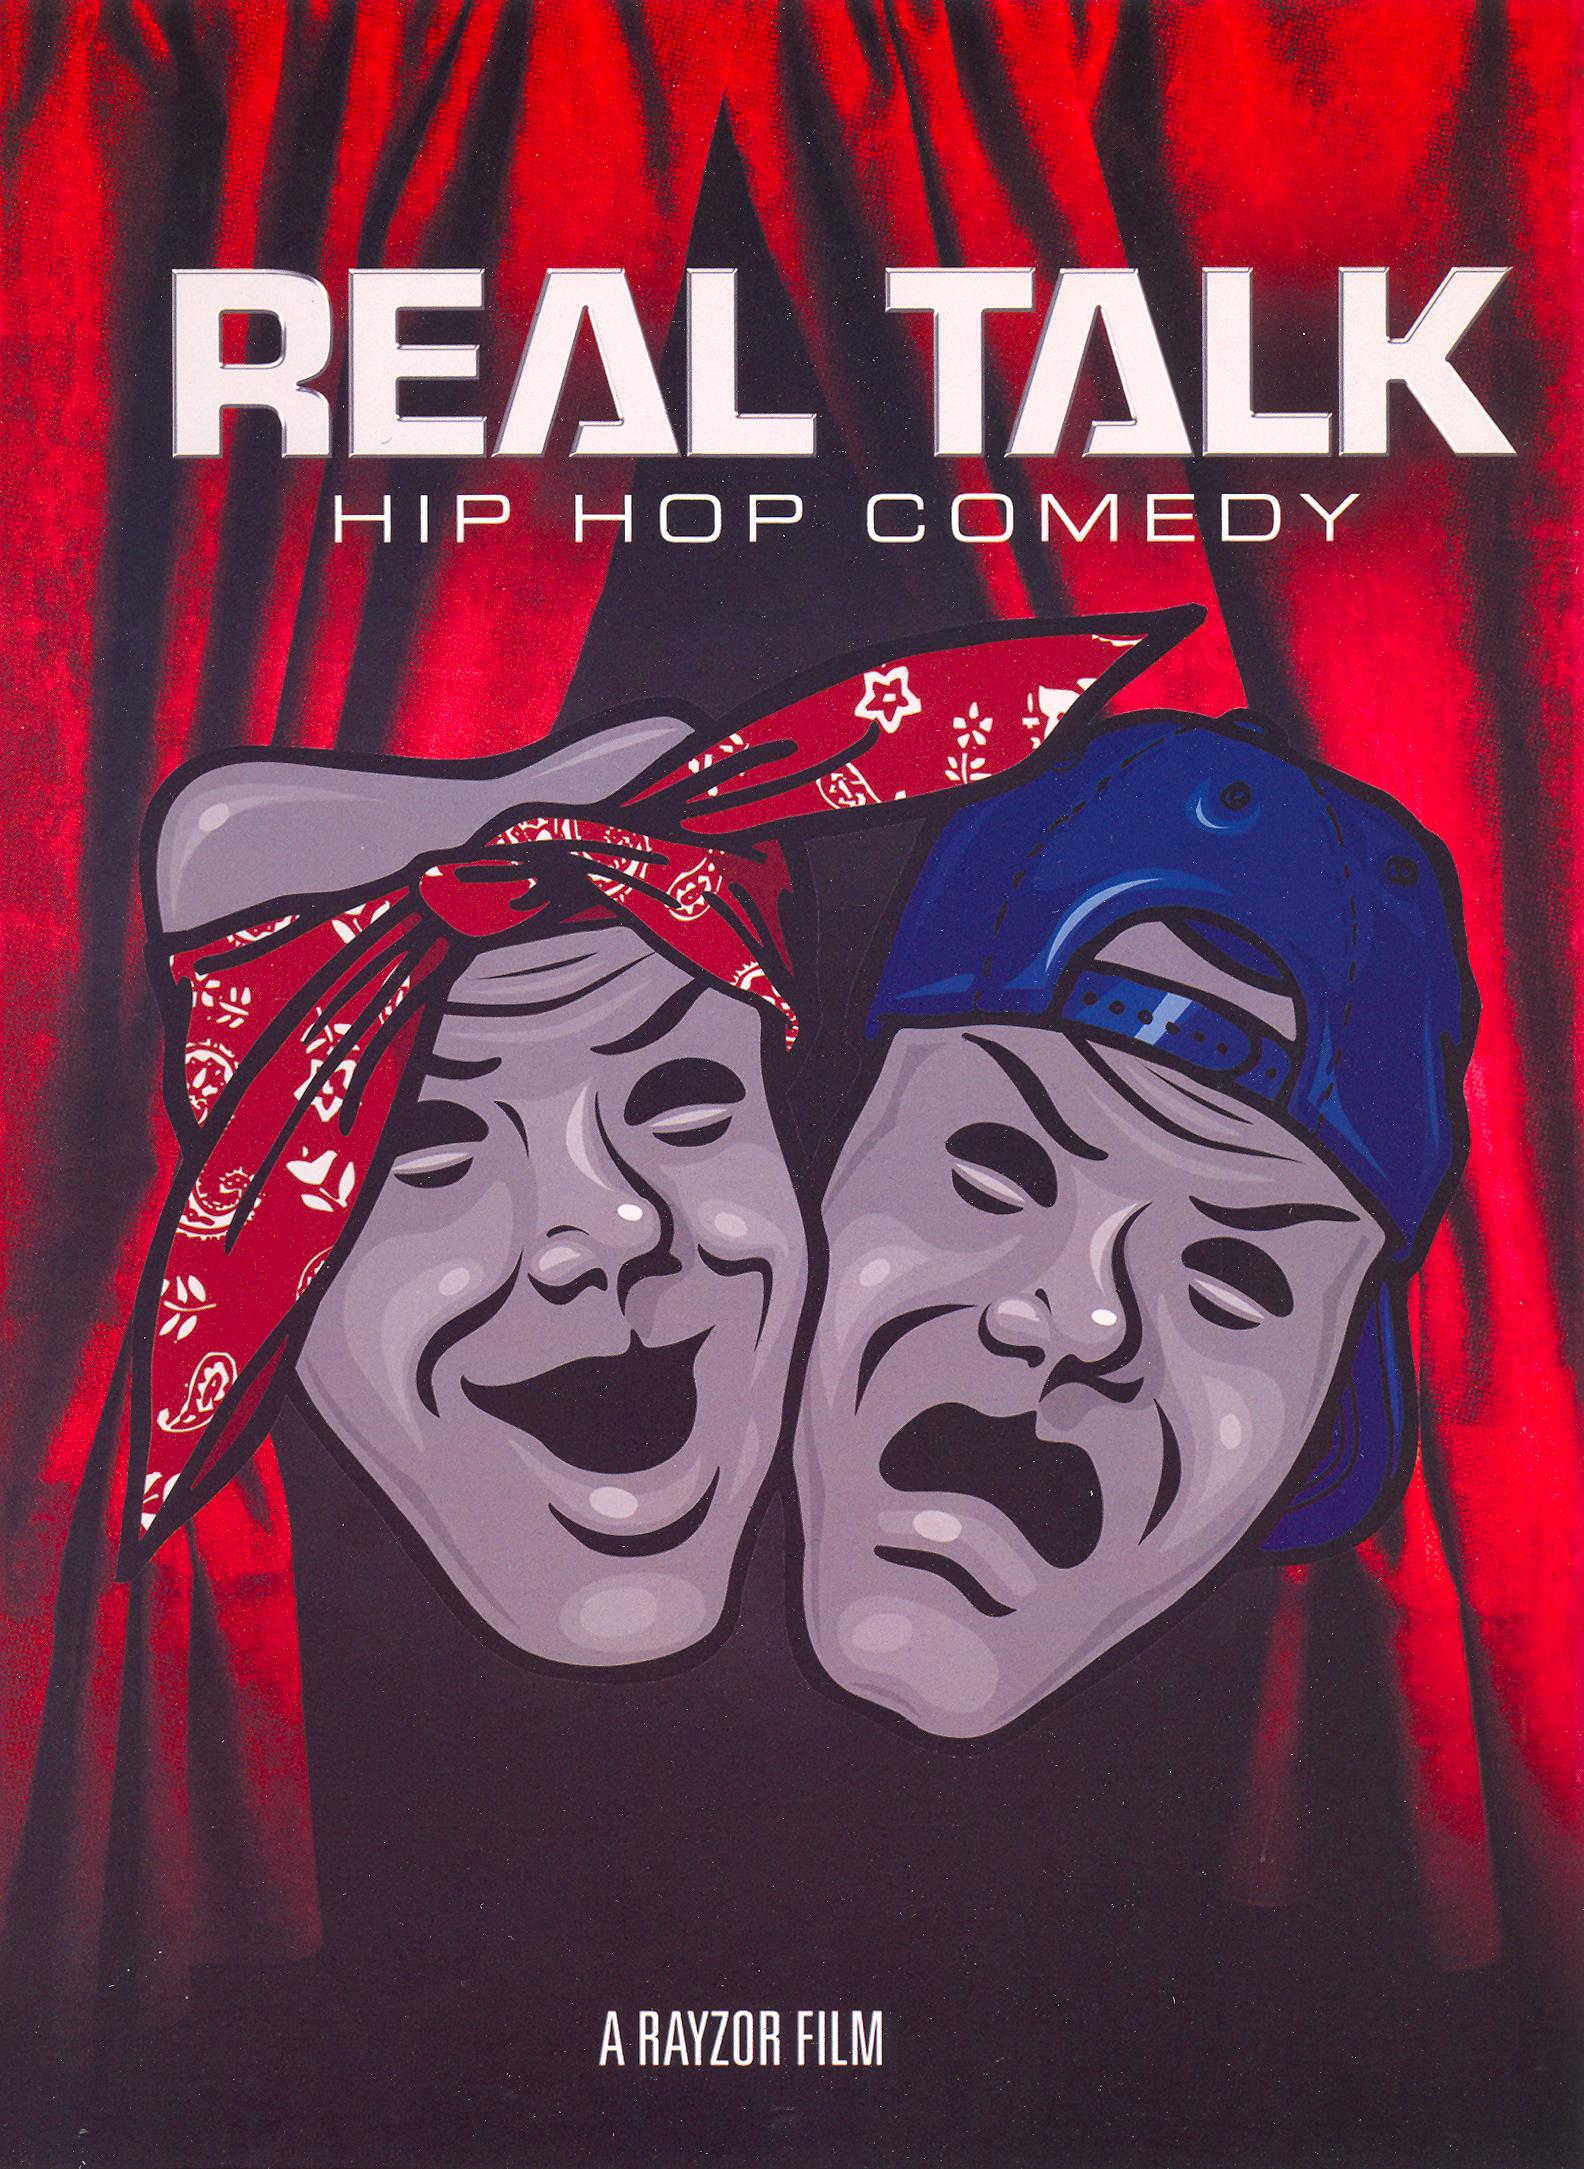 Real Talk: Hip Hop Comedy - Rayzor   Synopsis ...